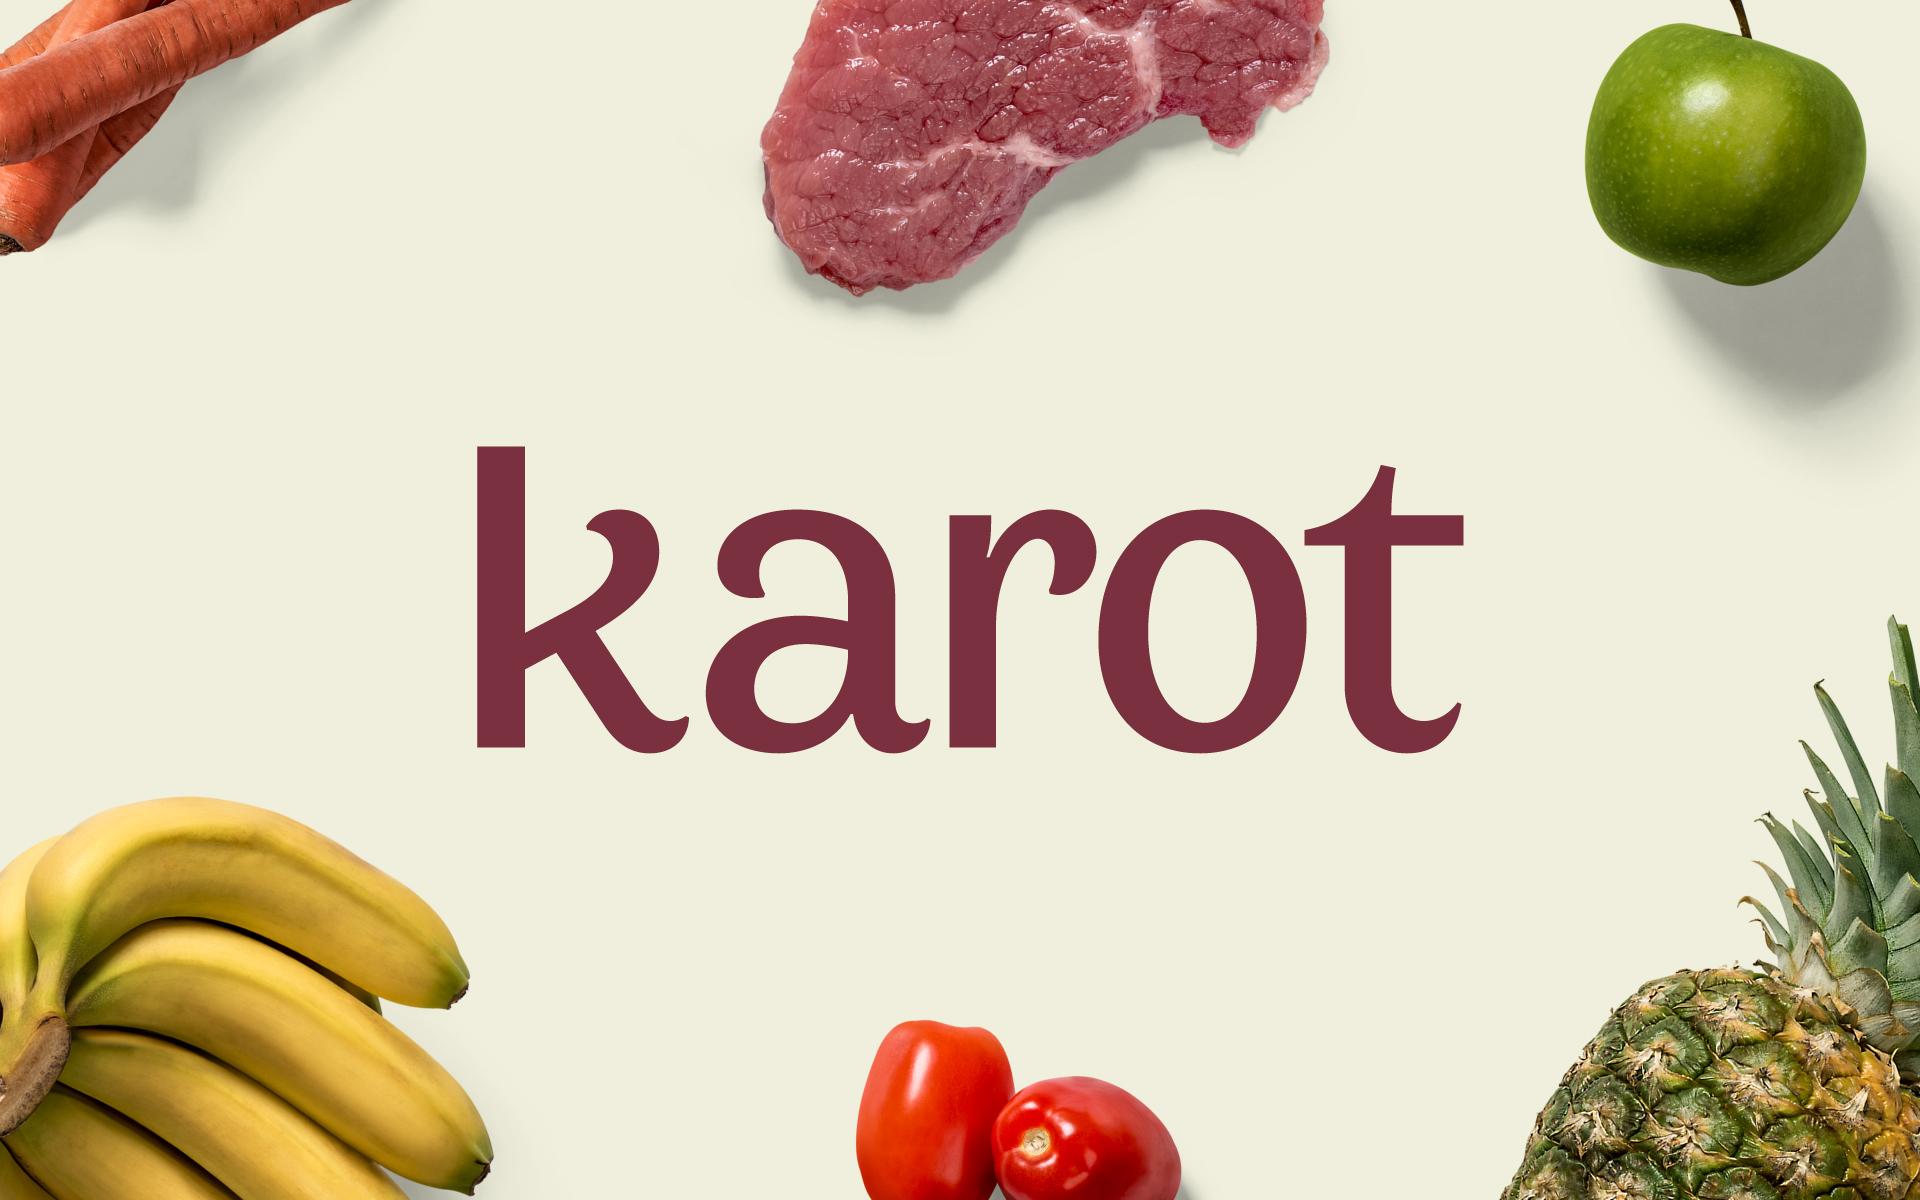 Karot-Brand-Identity-Design-33